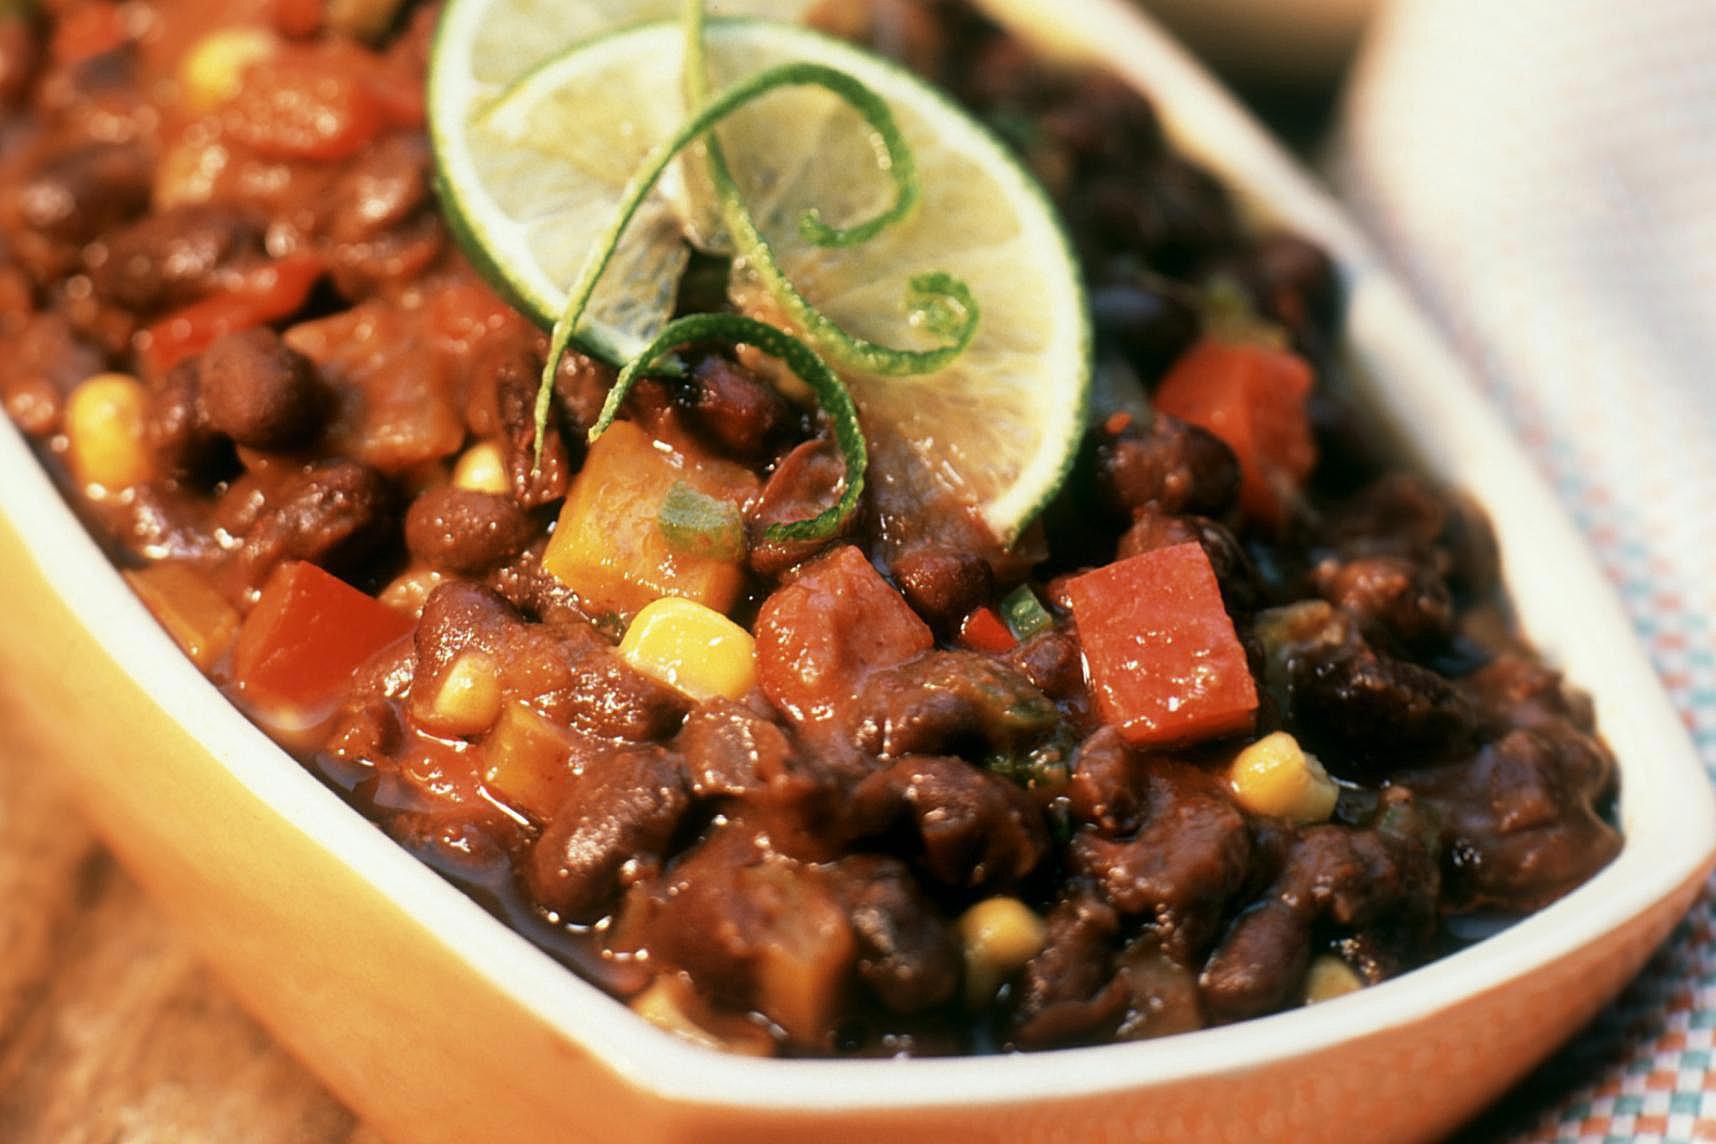 Crockpot black bean chili recipes for Crockpot fish recipes